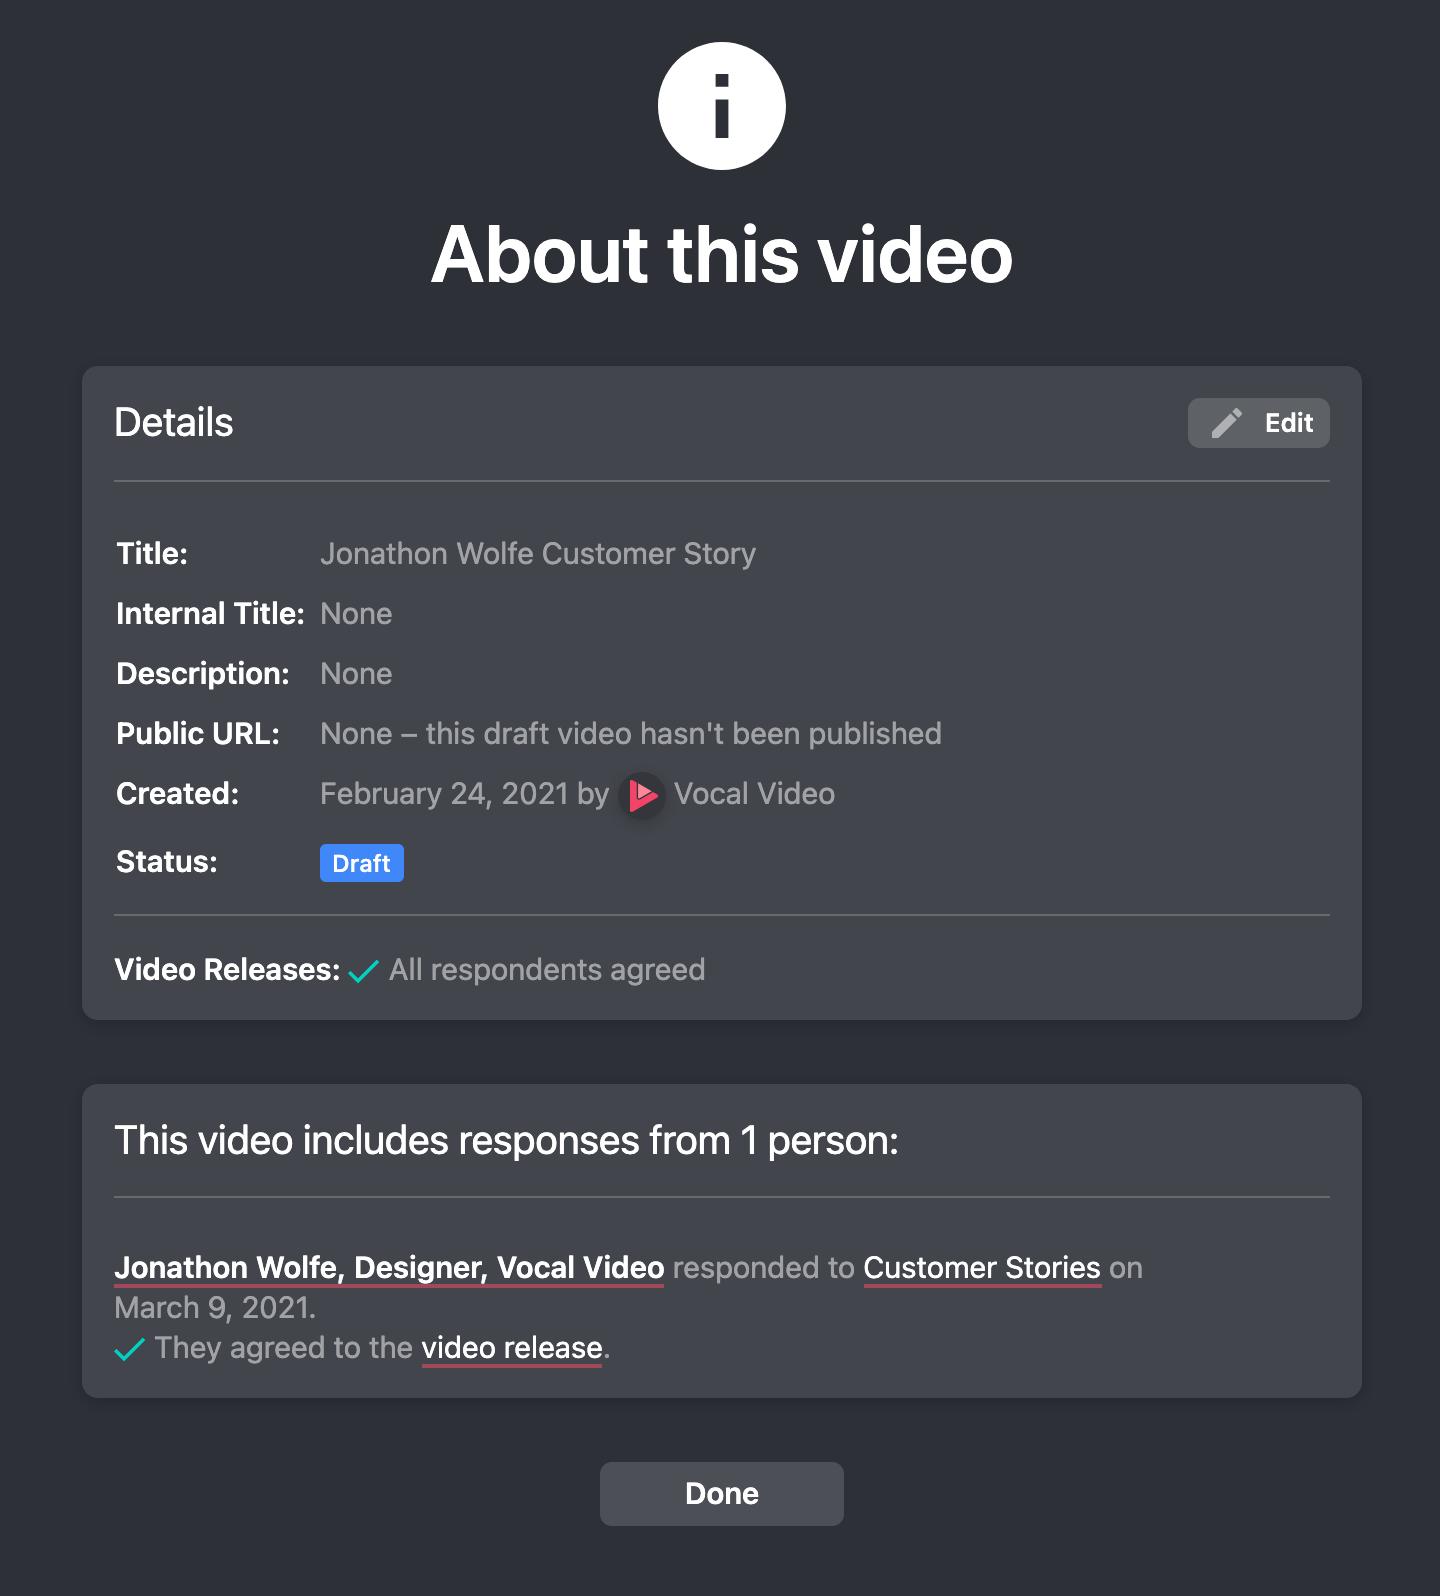 Video release details